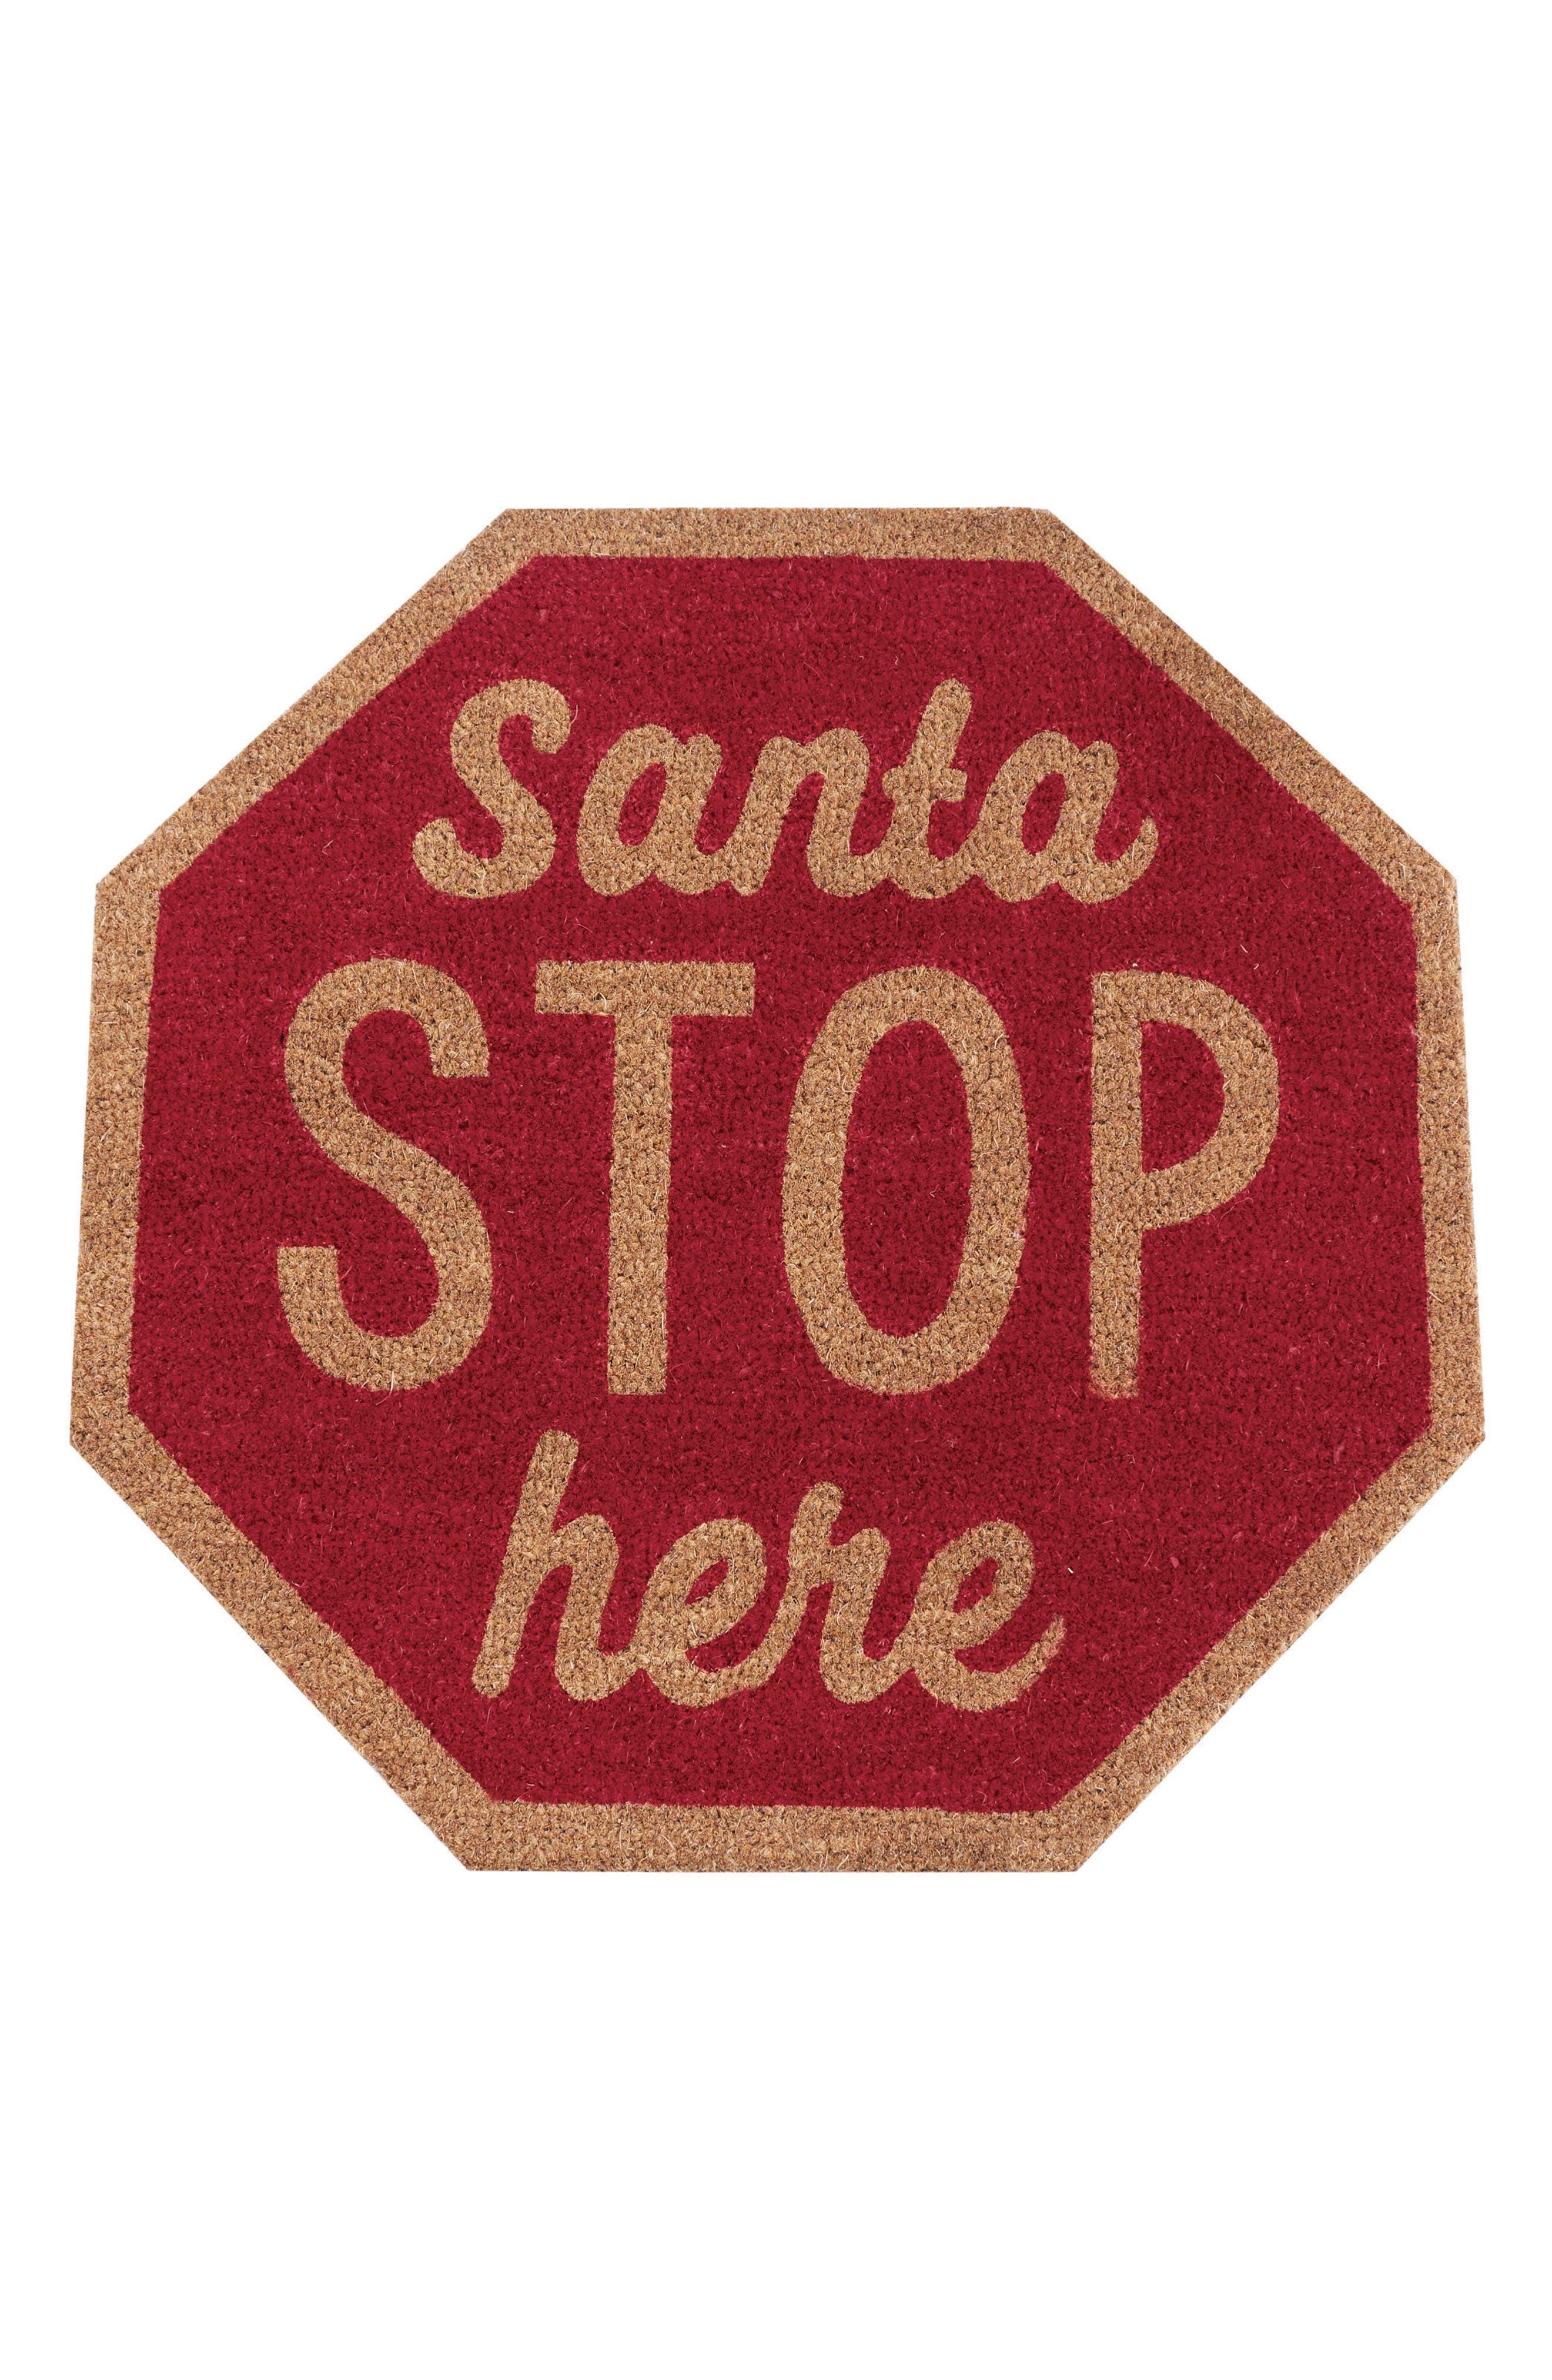 Alternate Image 1 Selected - Mud Pie Santa Stop Here Coir Door Mat